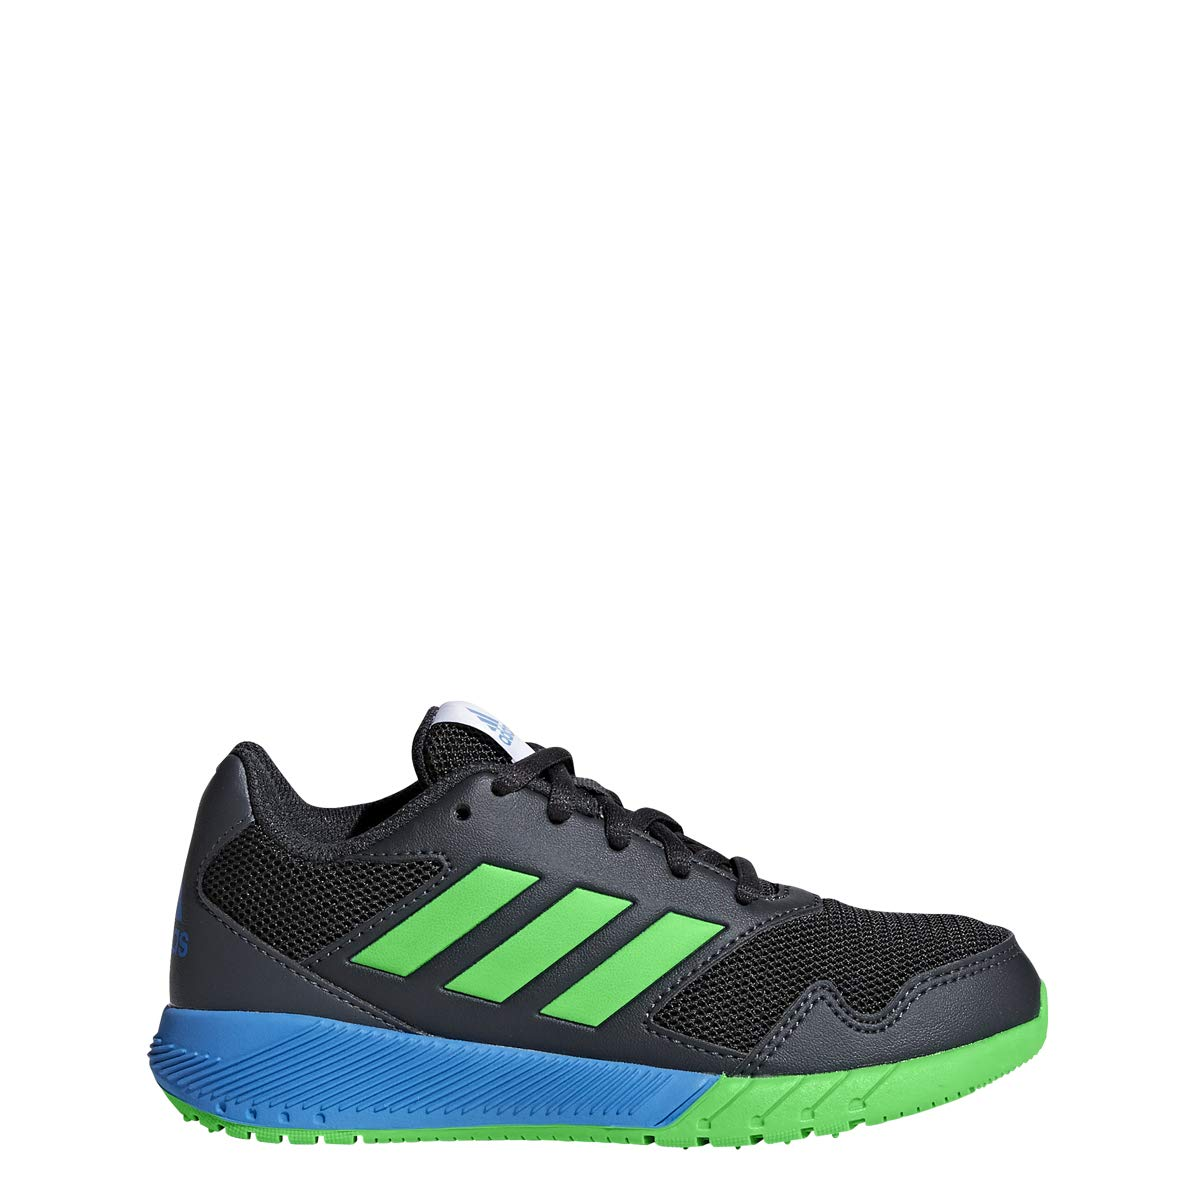 adidas Originals Unisex-Kids Altarun Running Shoe, Carbon/Vivid Green/Bright Blue, 4 M US Big Kid